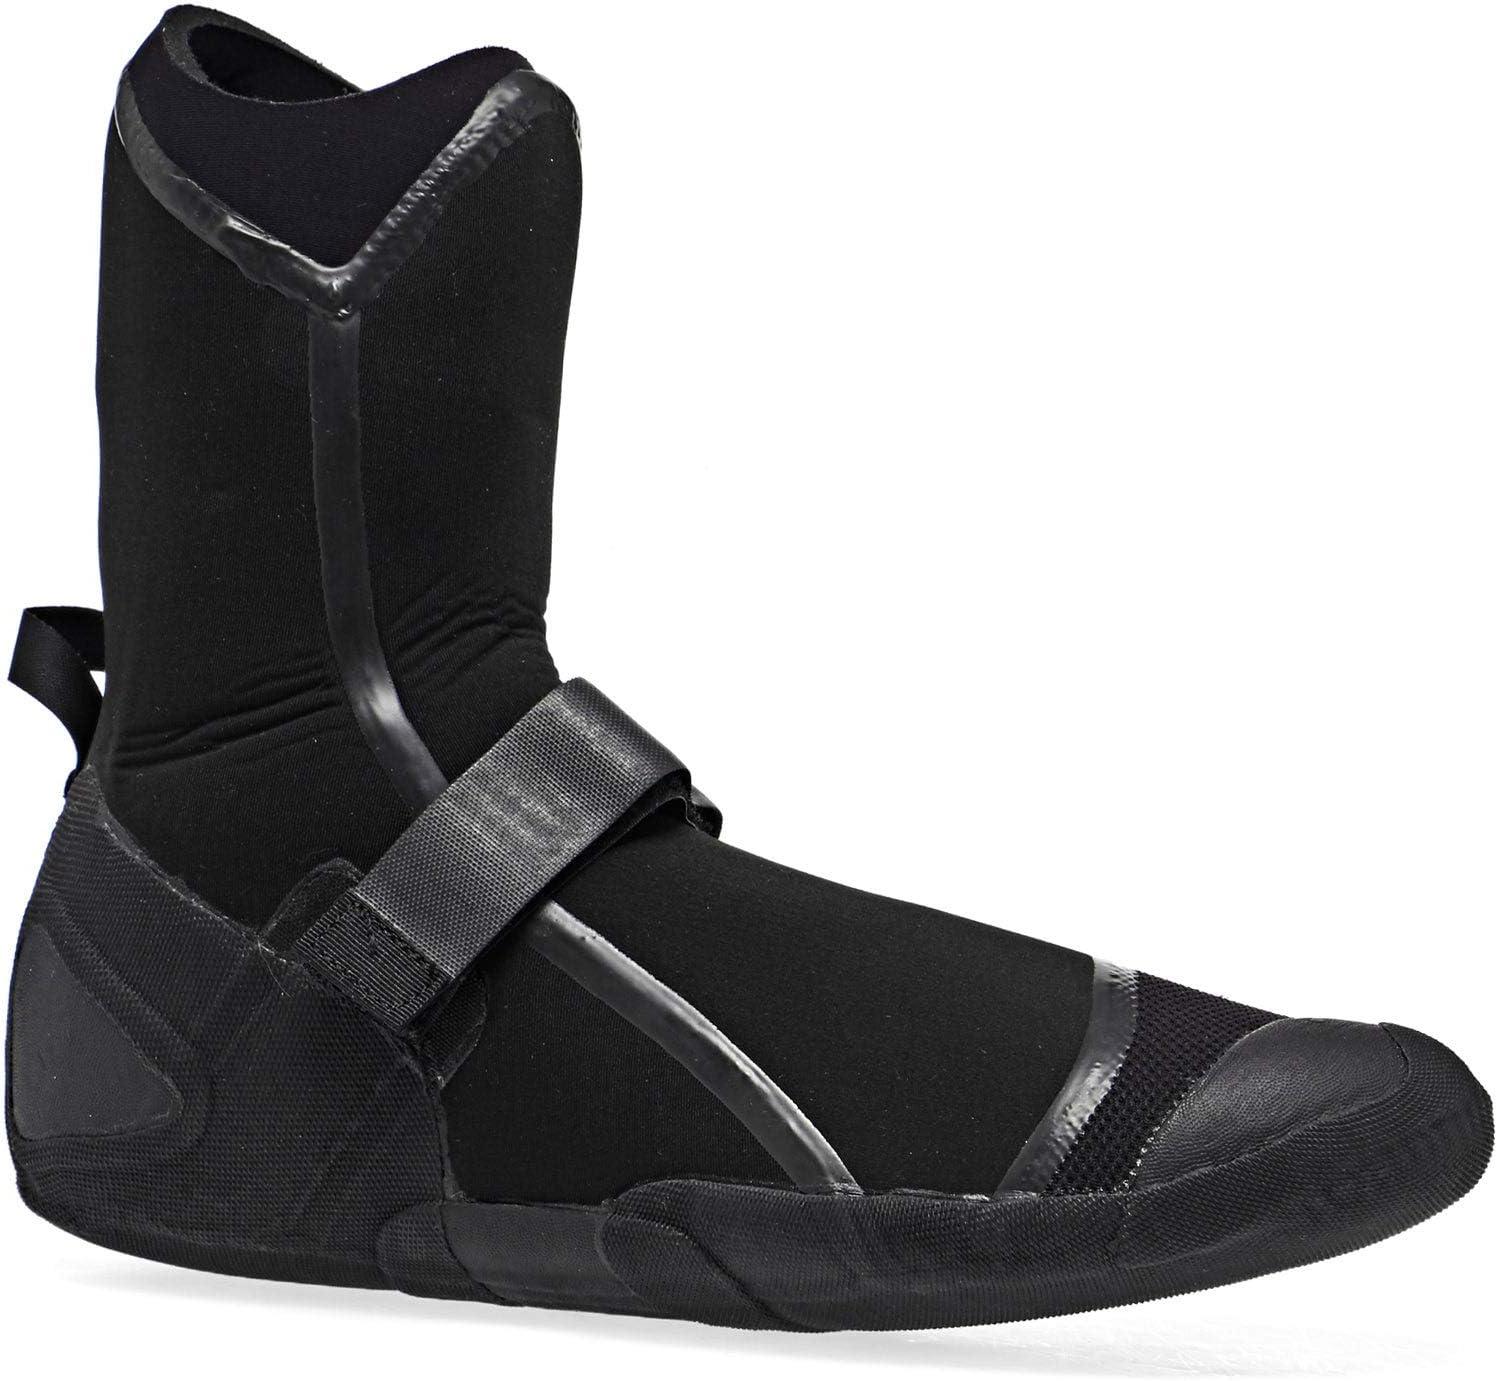 wetsuit boot